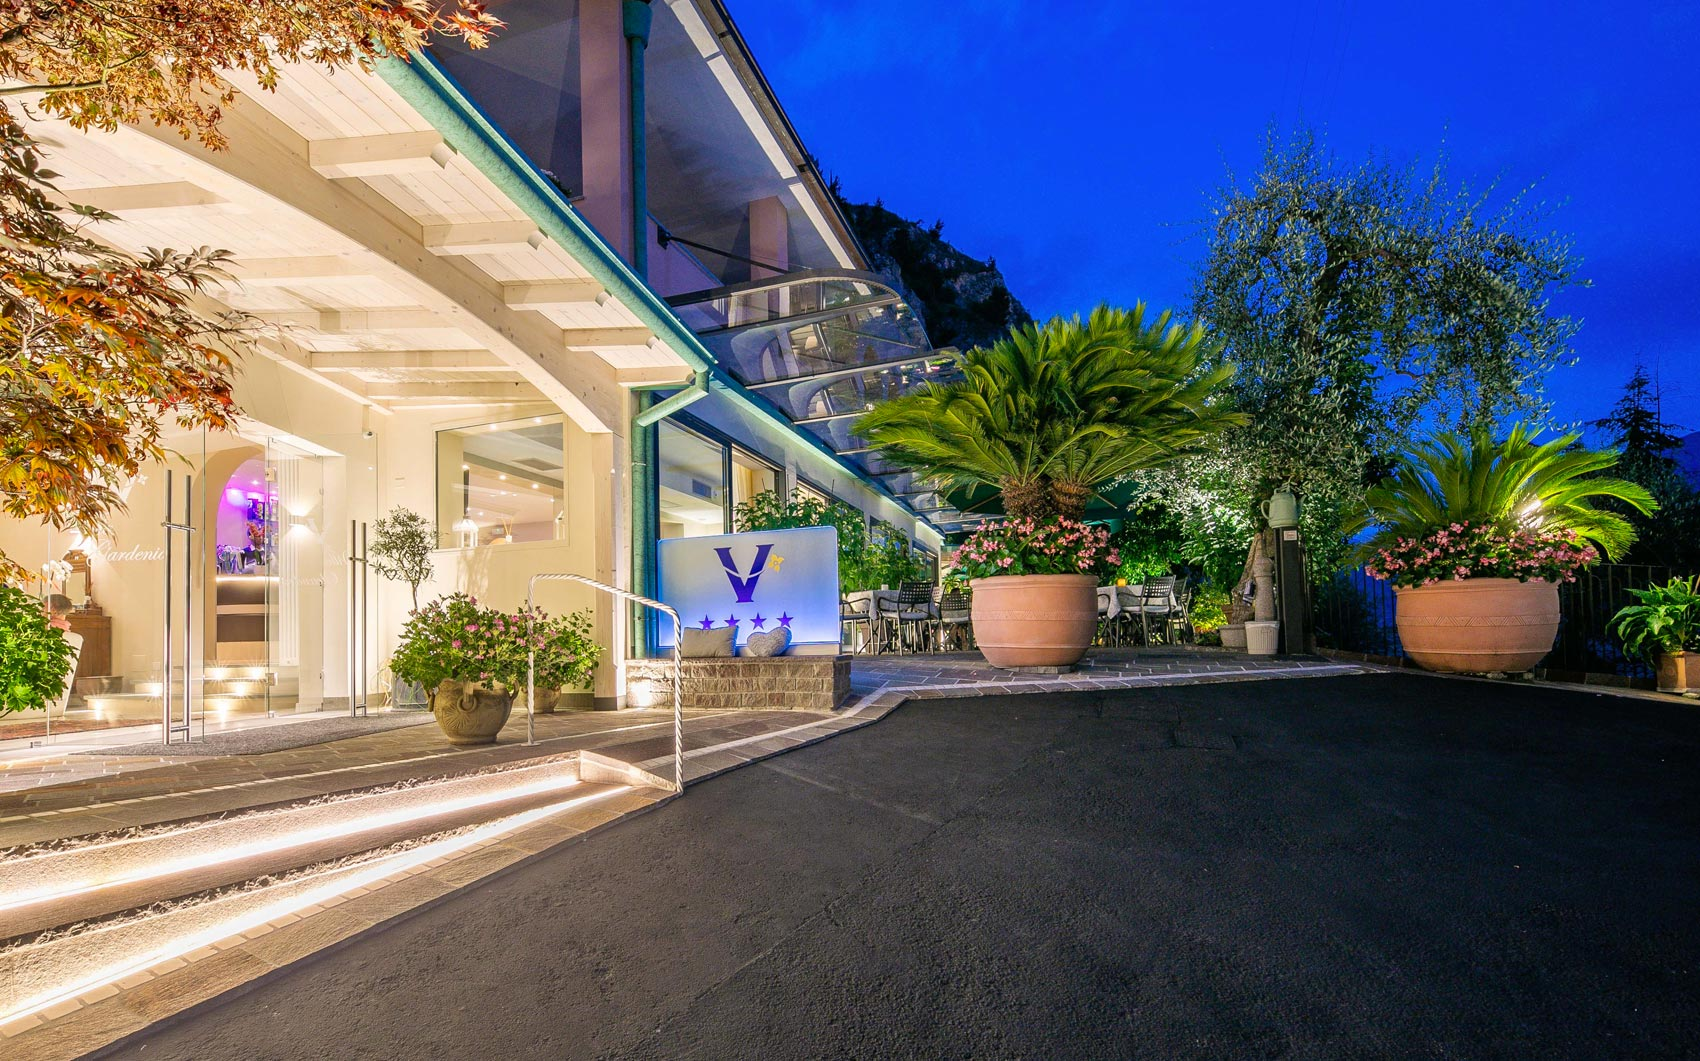 Hotel Villa gardenia am Gardasee